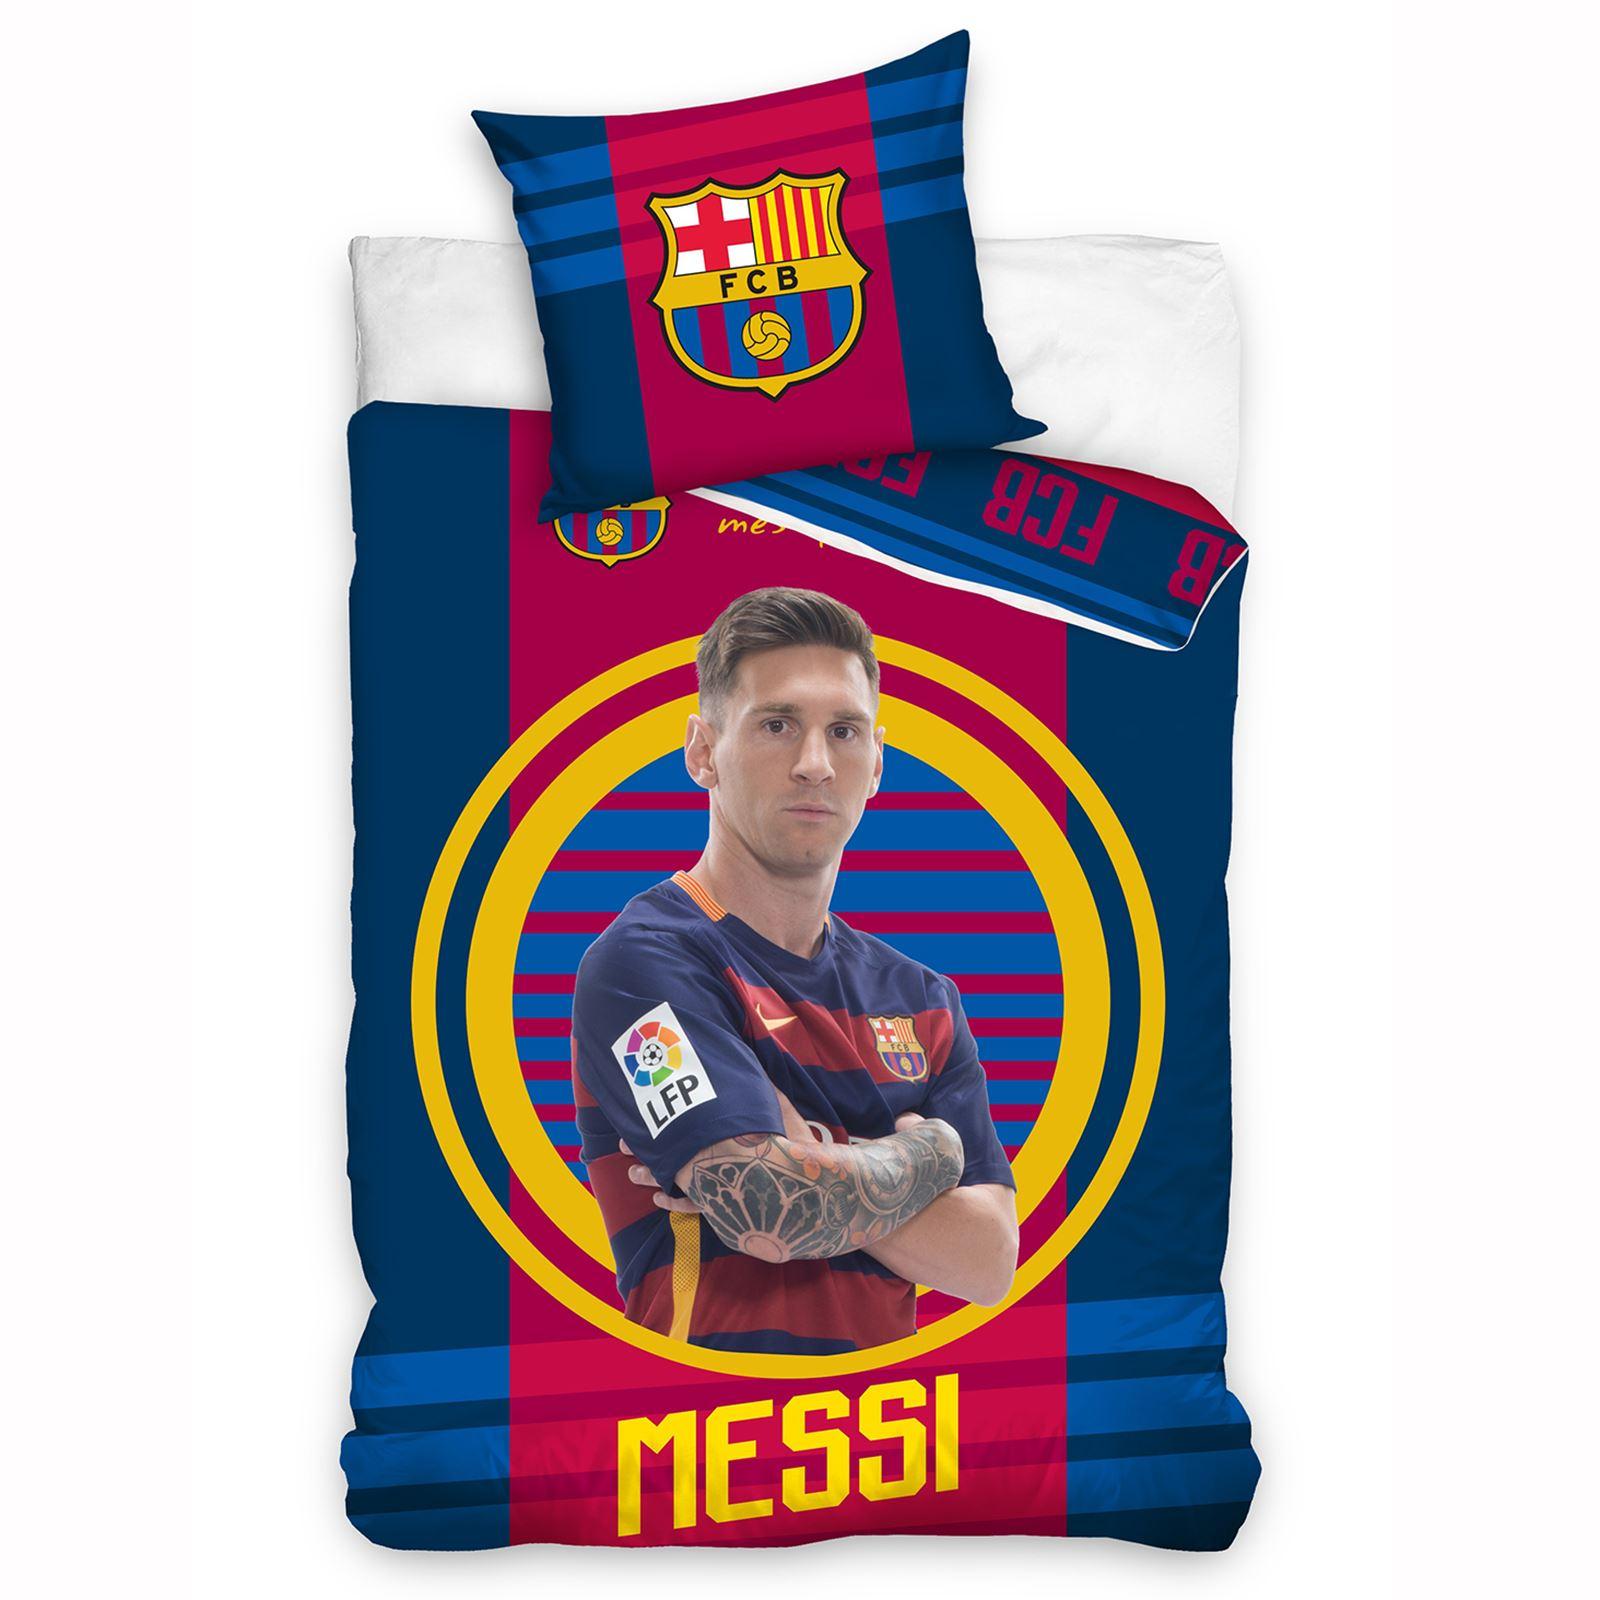 Football bedroom accessories